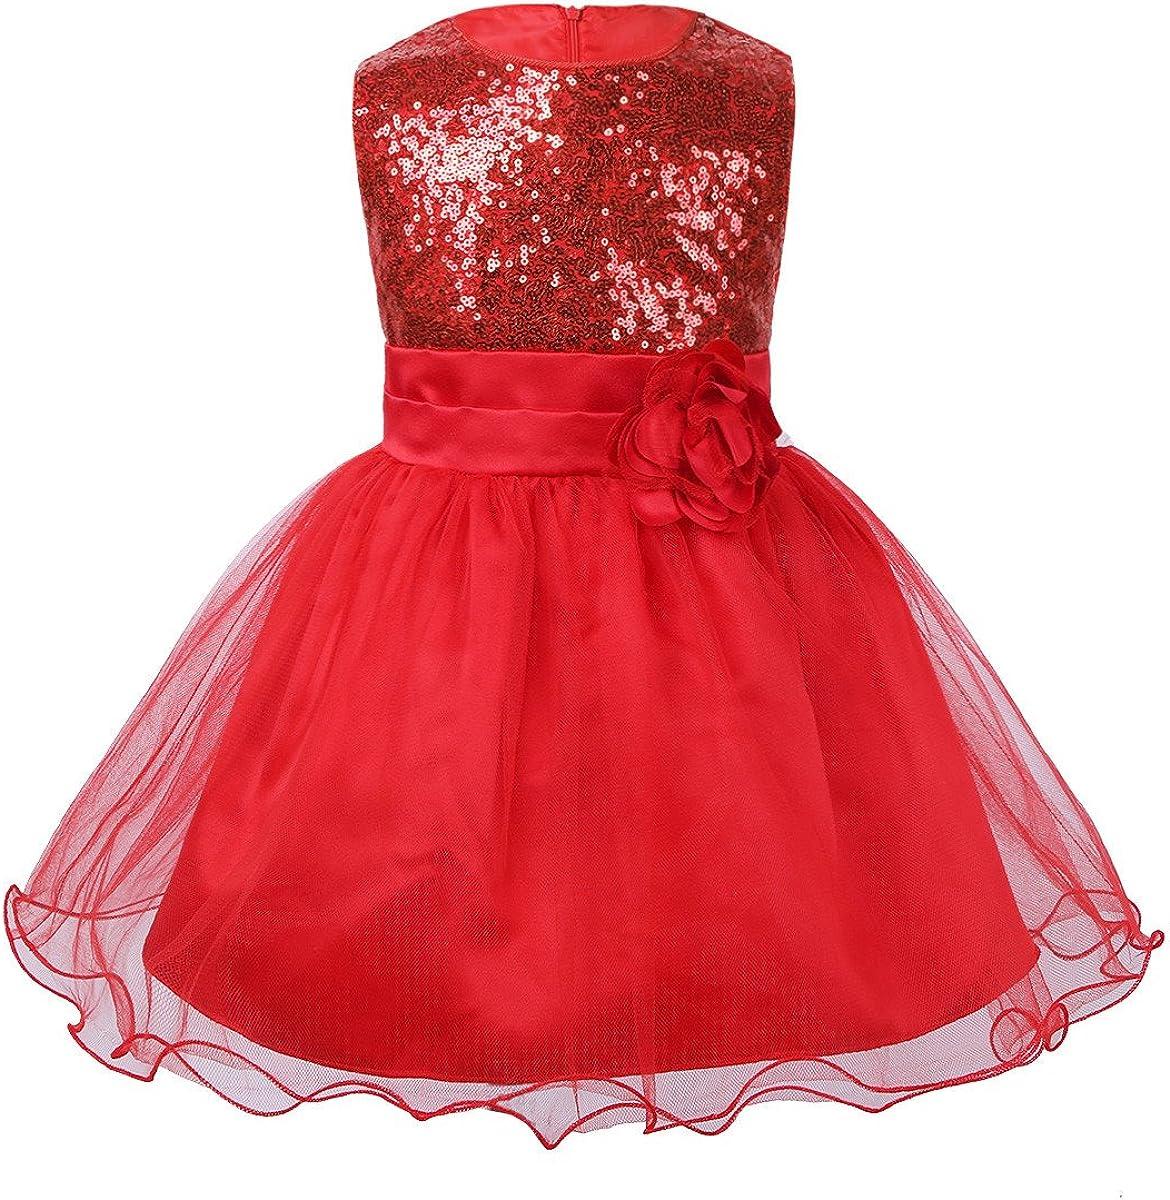 Cheap Freebily Little Baby Girl Dress Sleeveless Sequined Great interest W Tulle Tutu